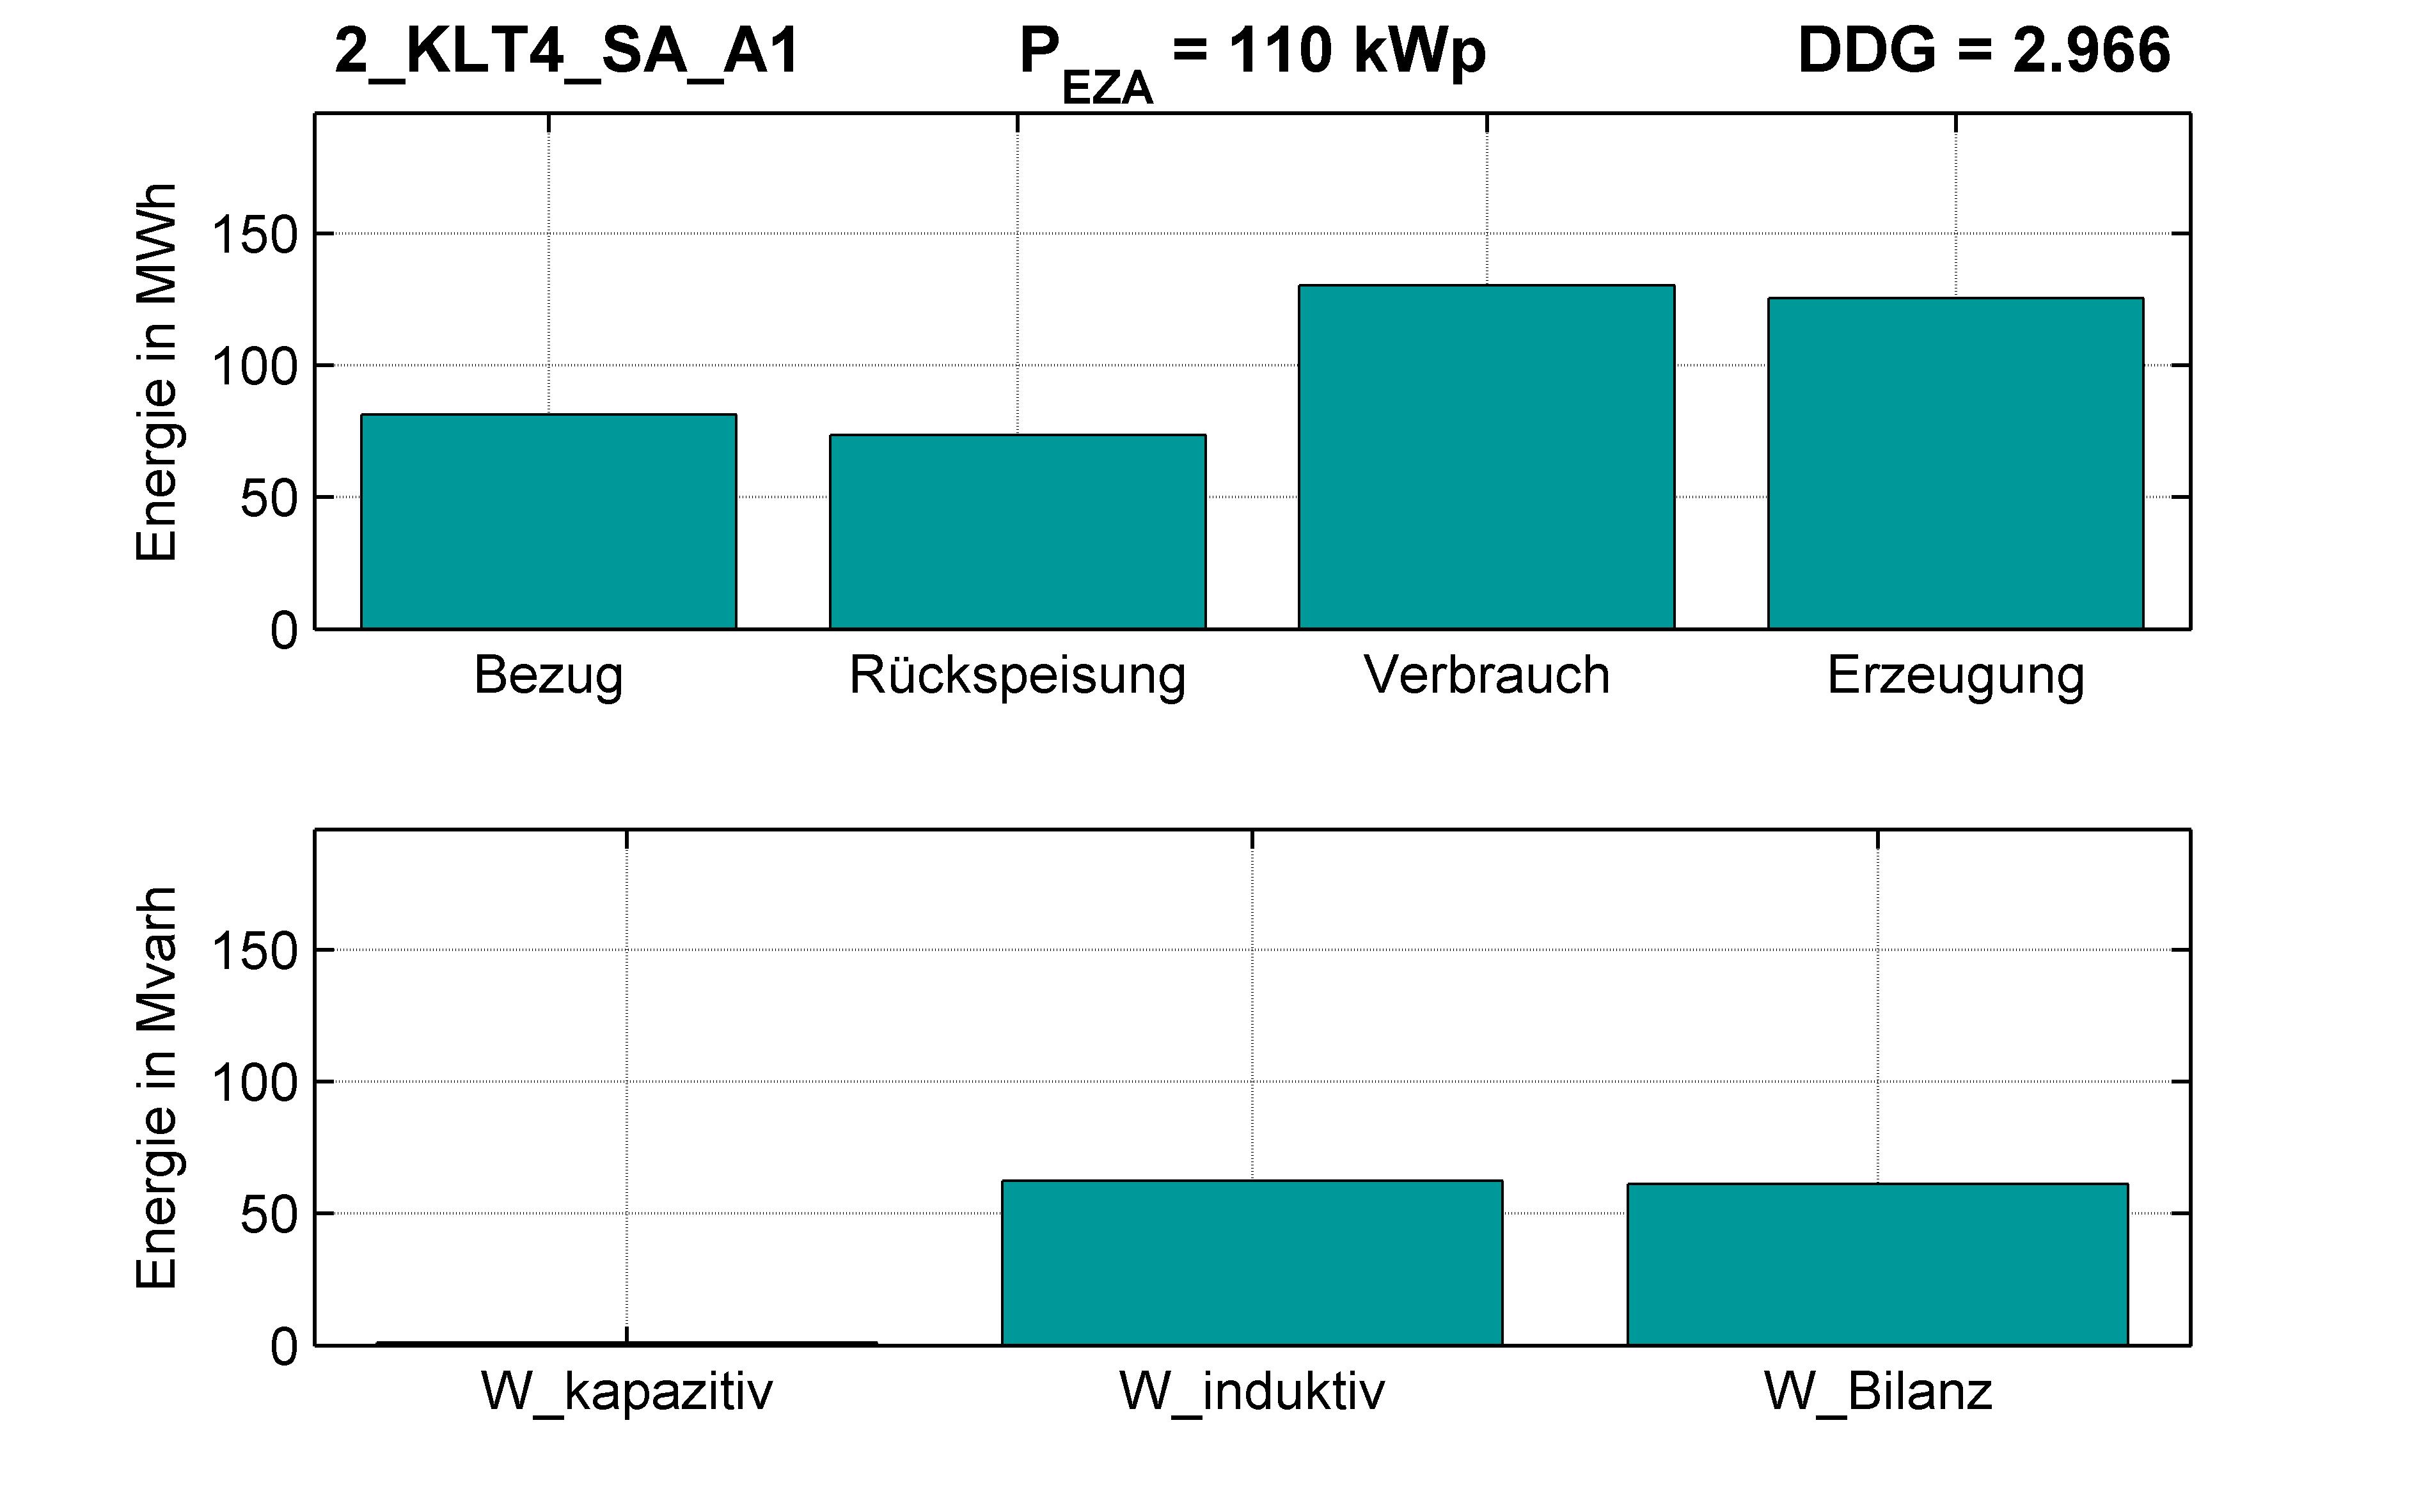 KLT4 | P-Kappung 85% (SA) A1 | PQ-Bilanz